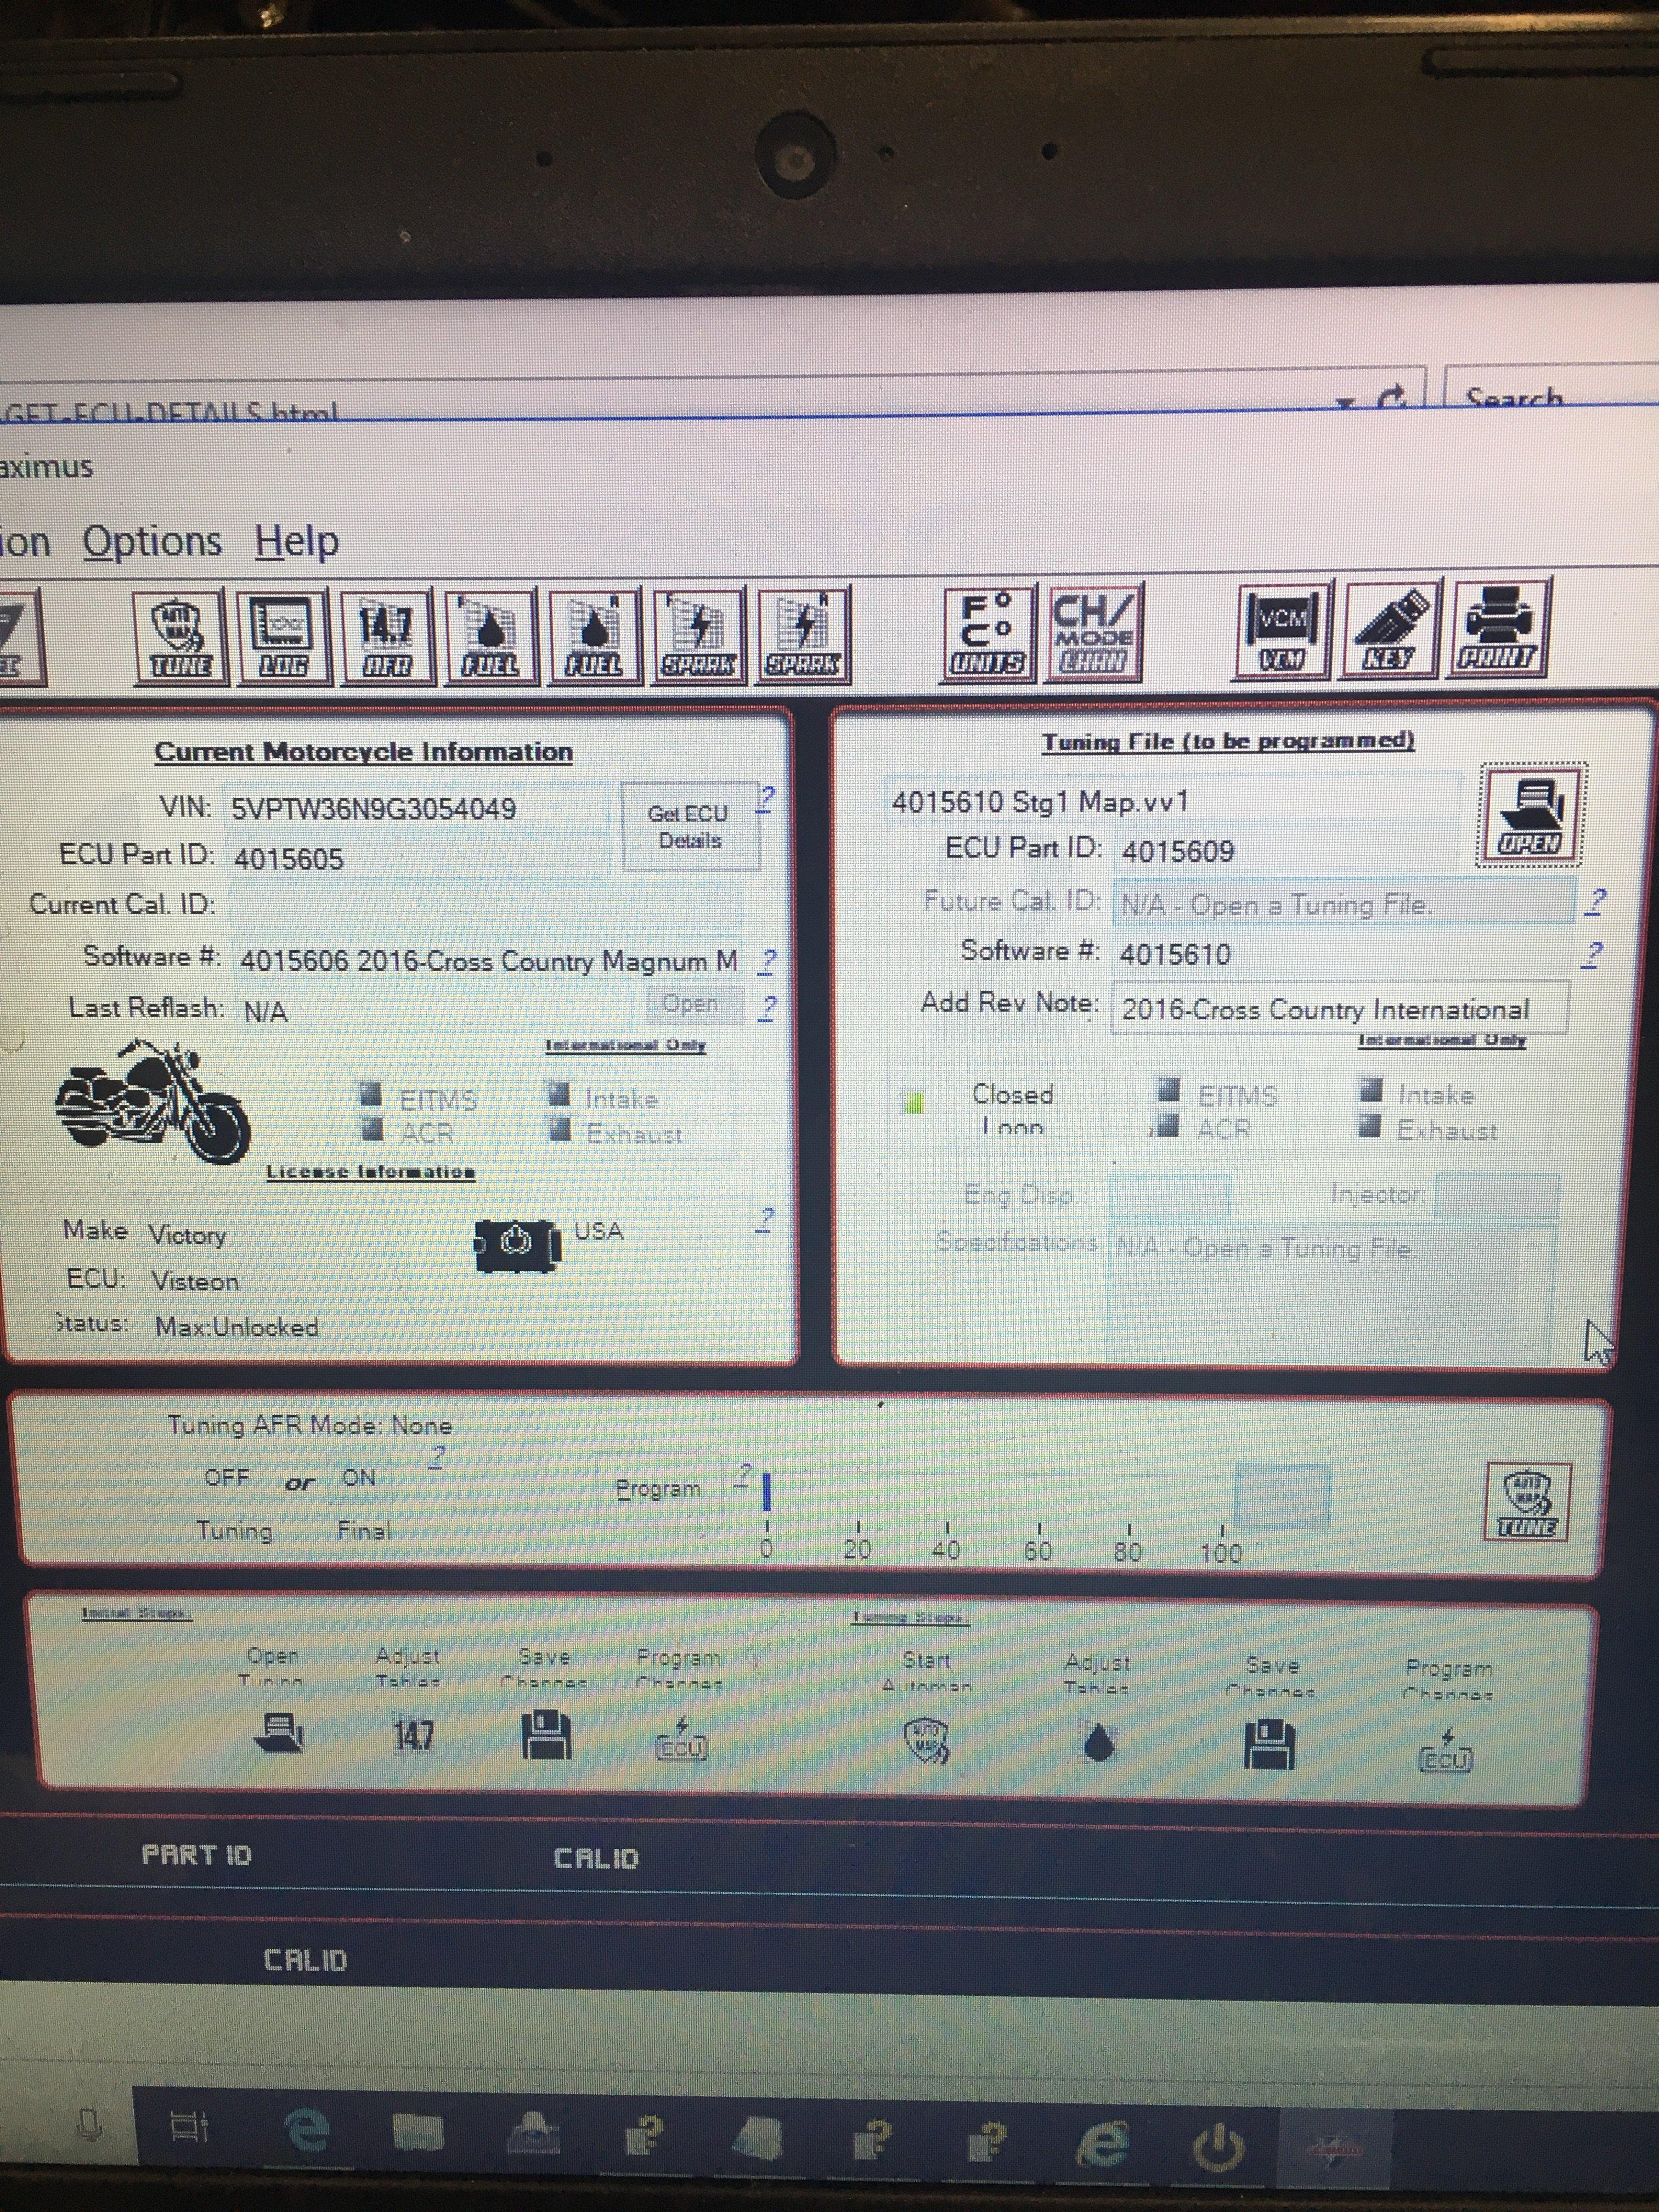 B60E4C6D-DF52-40DB-A8C0-4C354A057D6D.jpeg